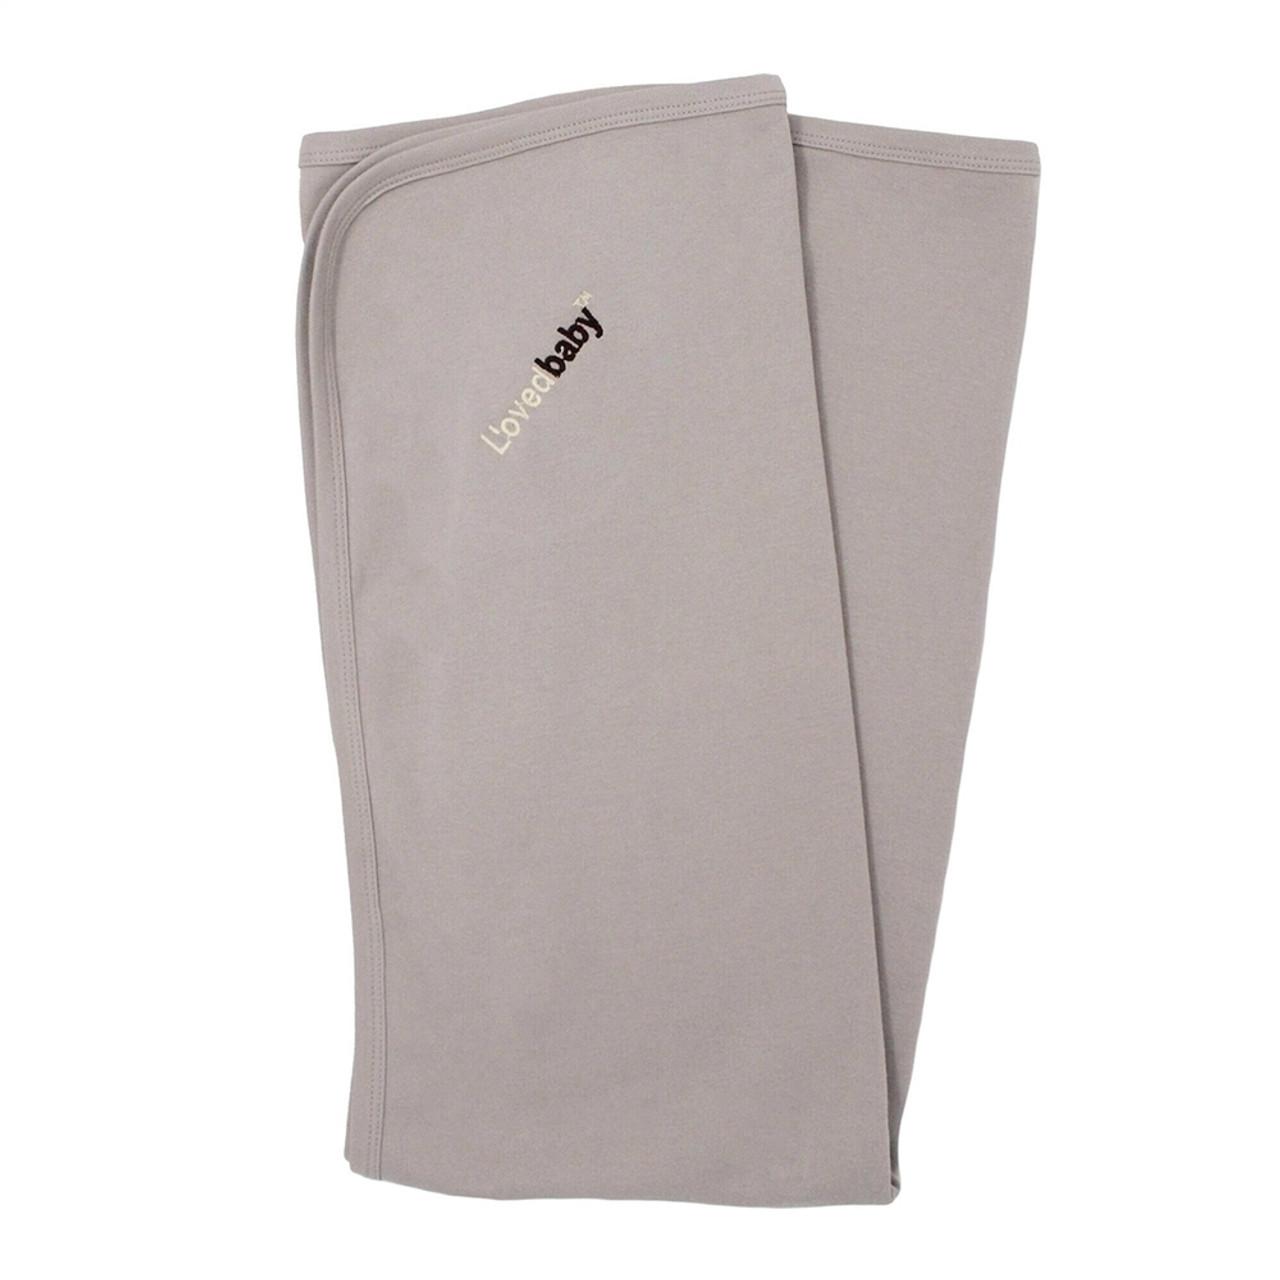 Organic Baby Blankets - Solid Grey